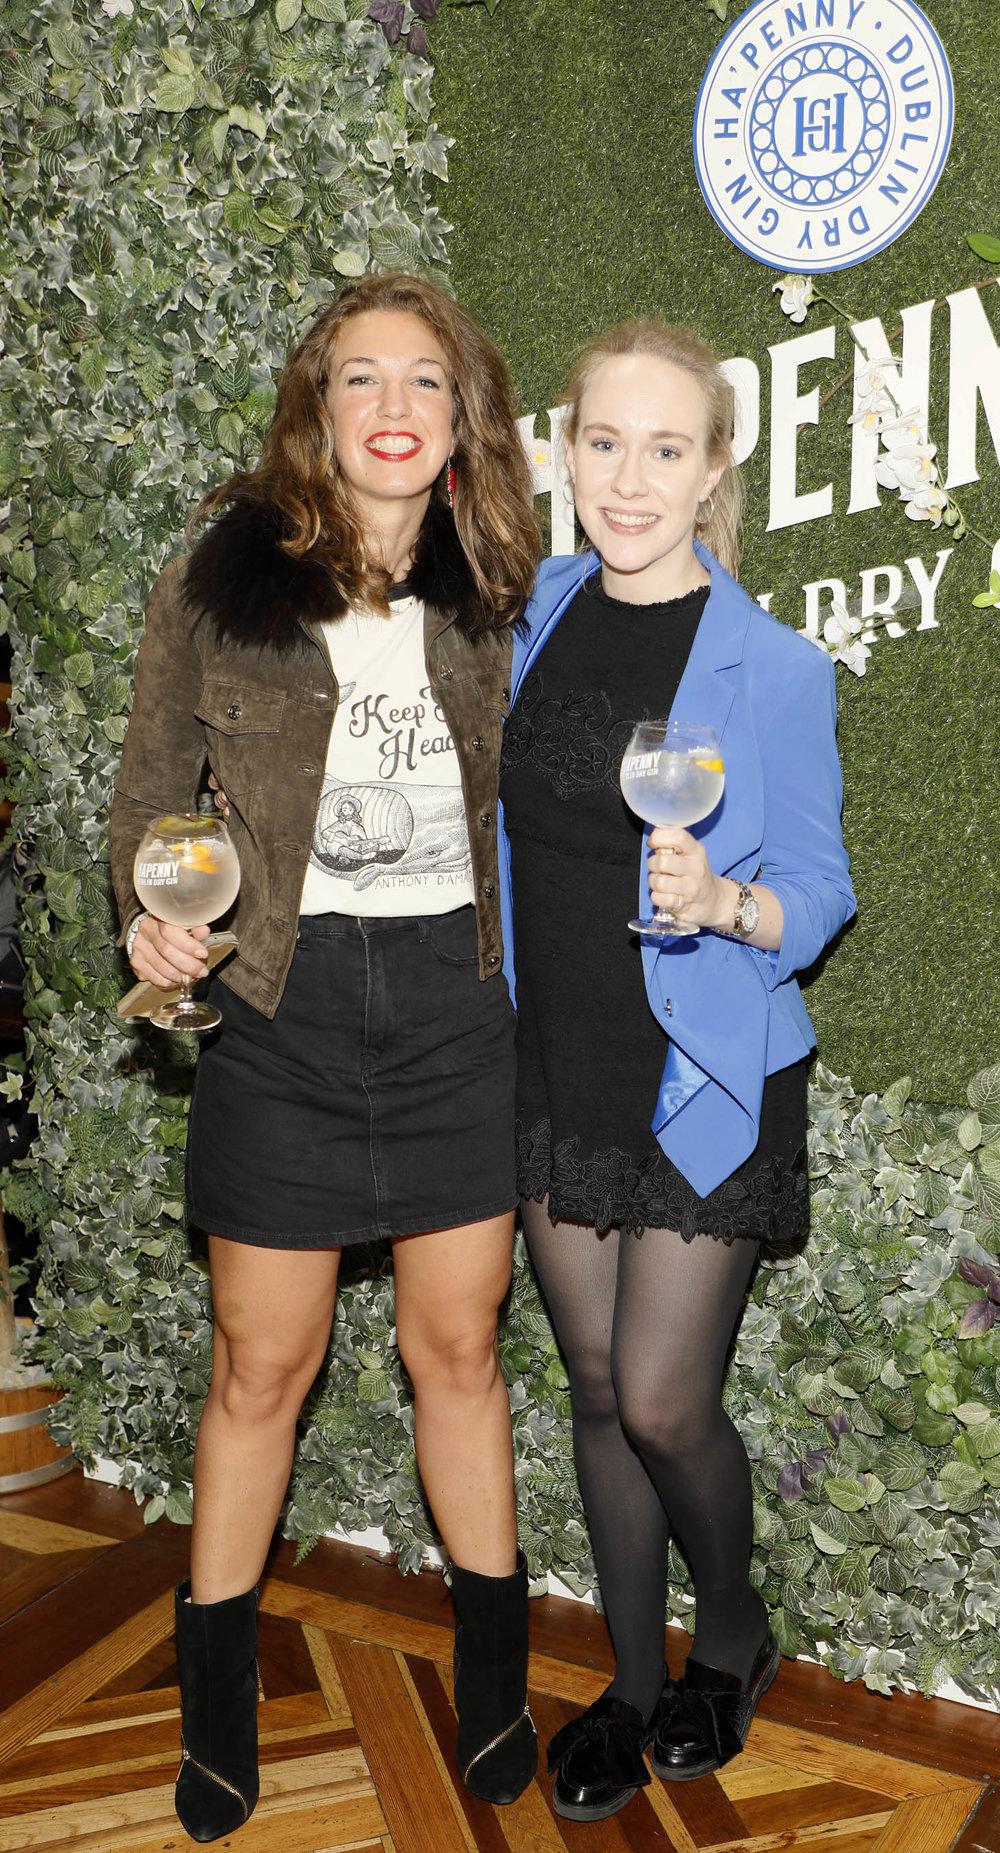 Glenda Benedetti and Rachel Byrne at the launch of the Ha'penny Spirits range.jpg